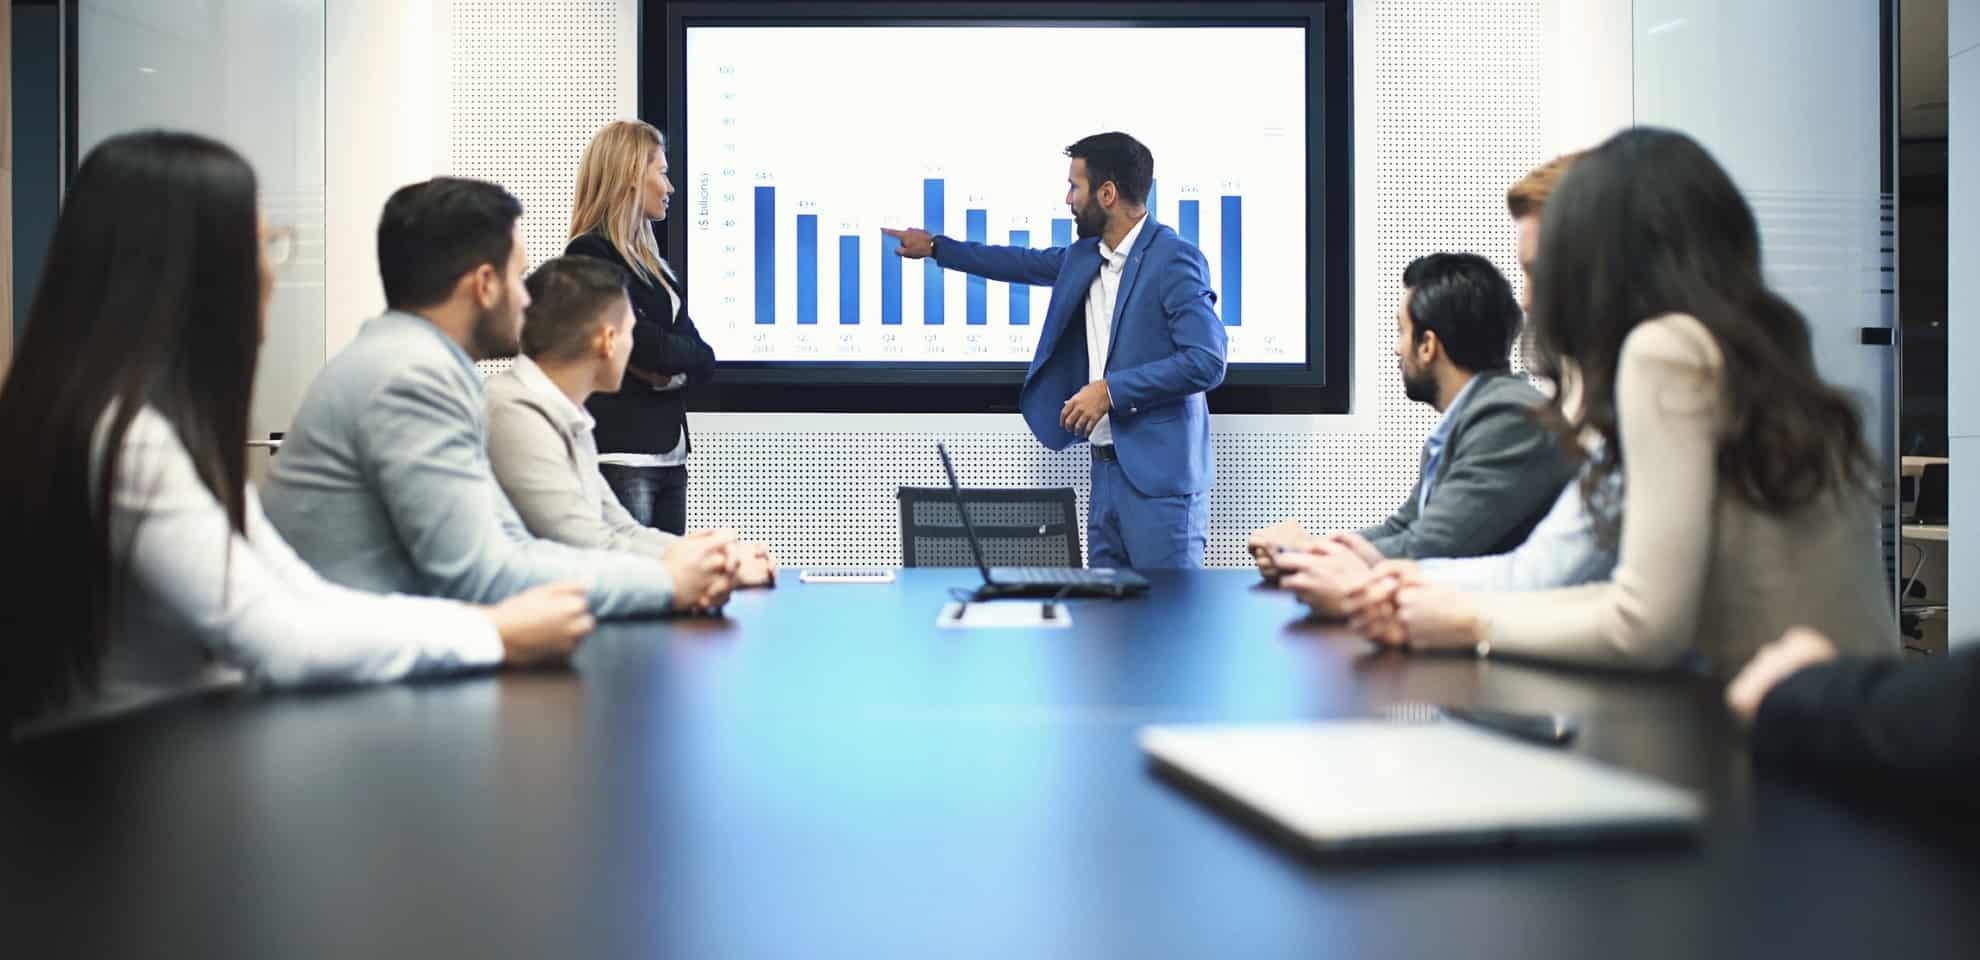 مدارک مورد نیاز جهت اخذ رتبه ۳ مشاور مدیریت